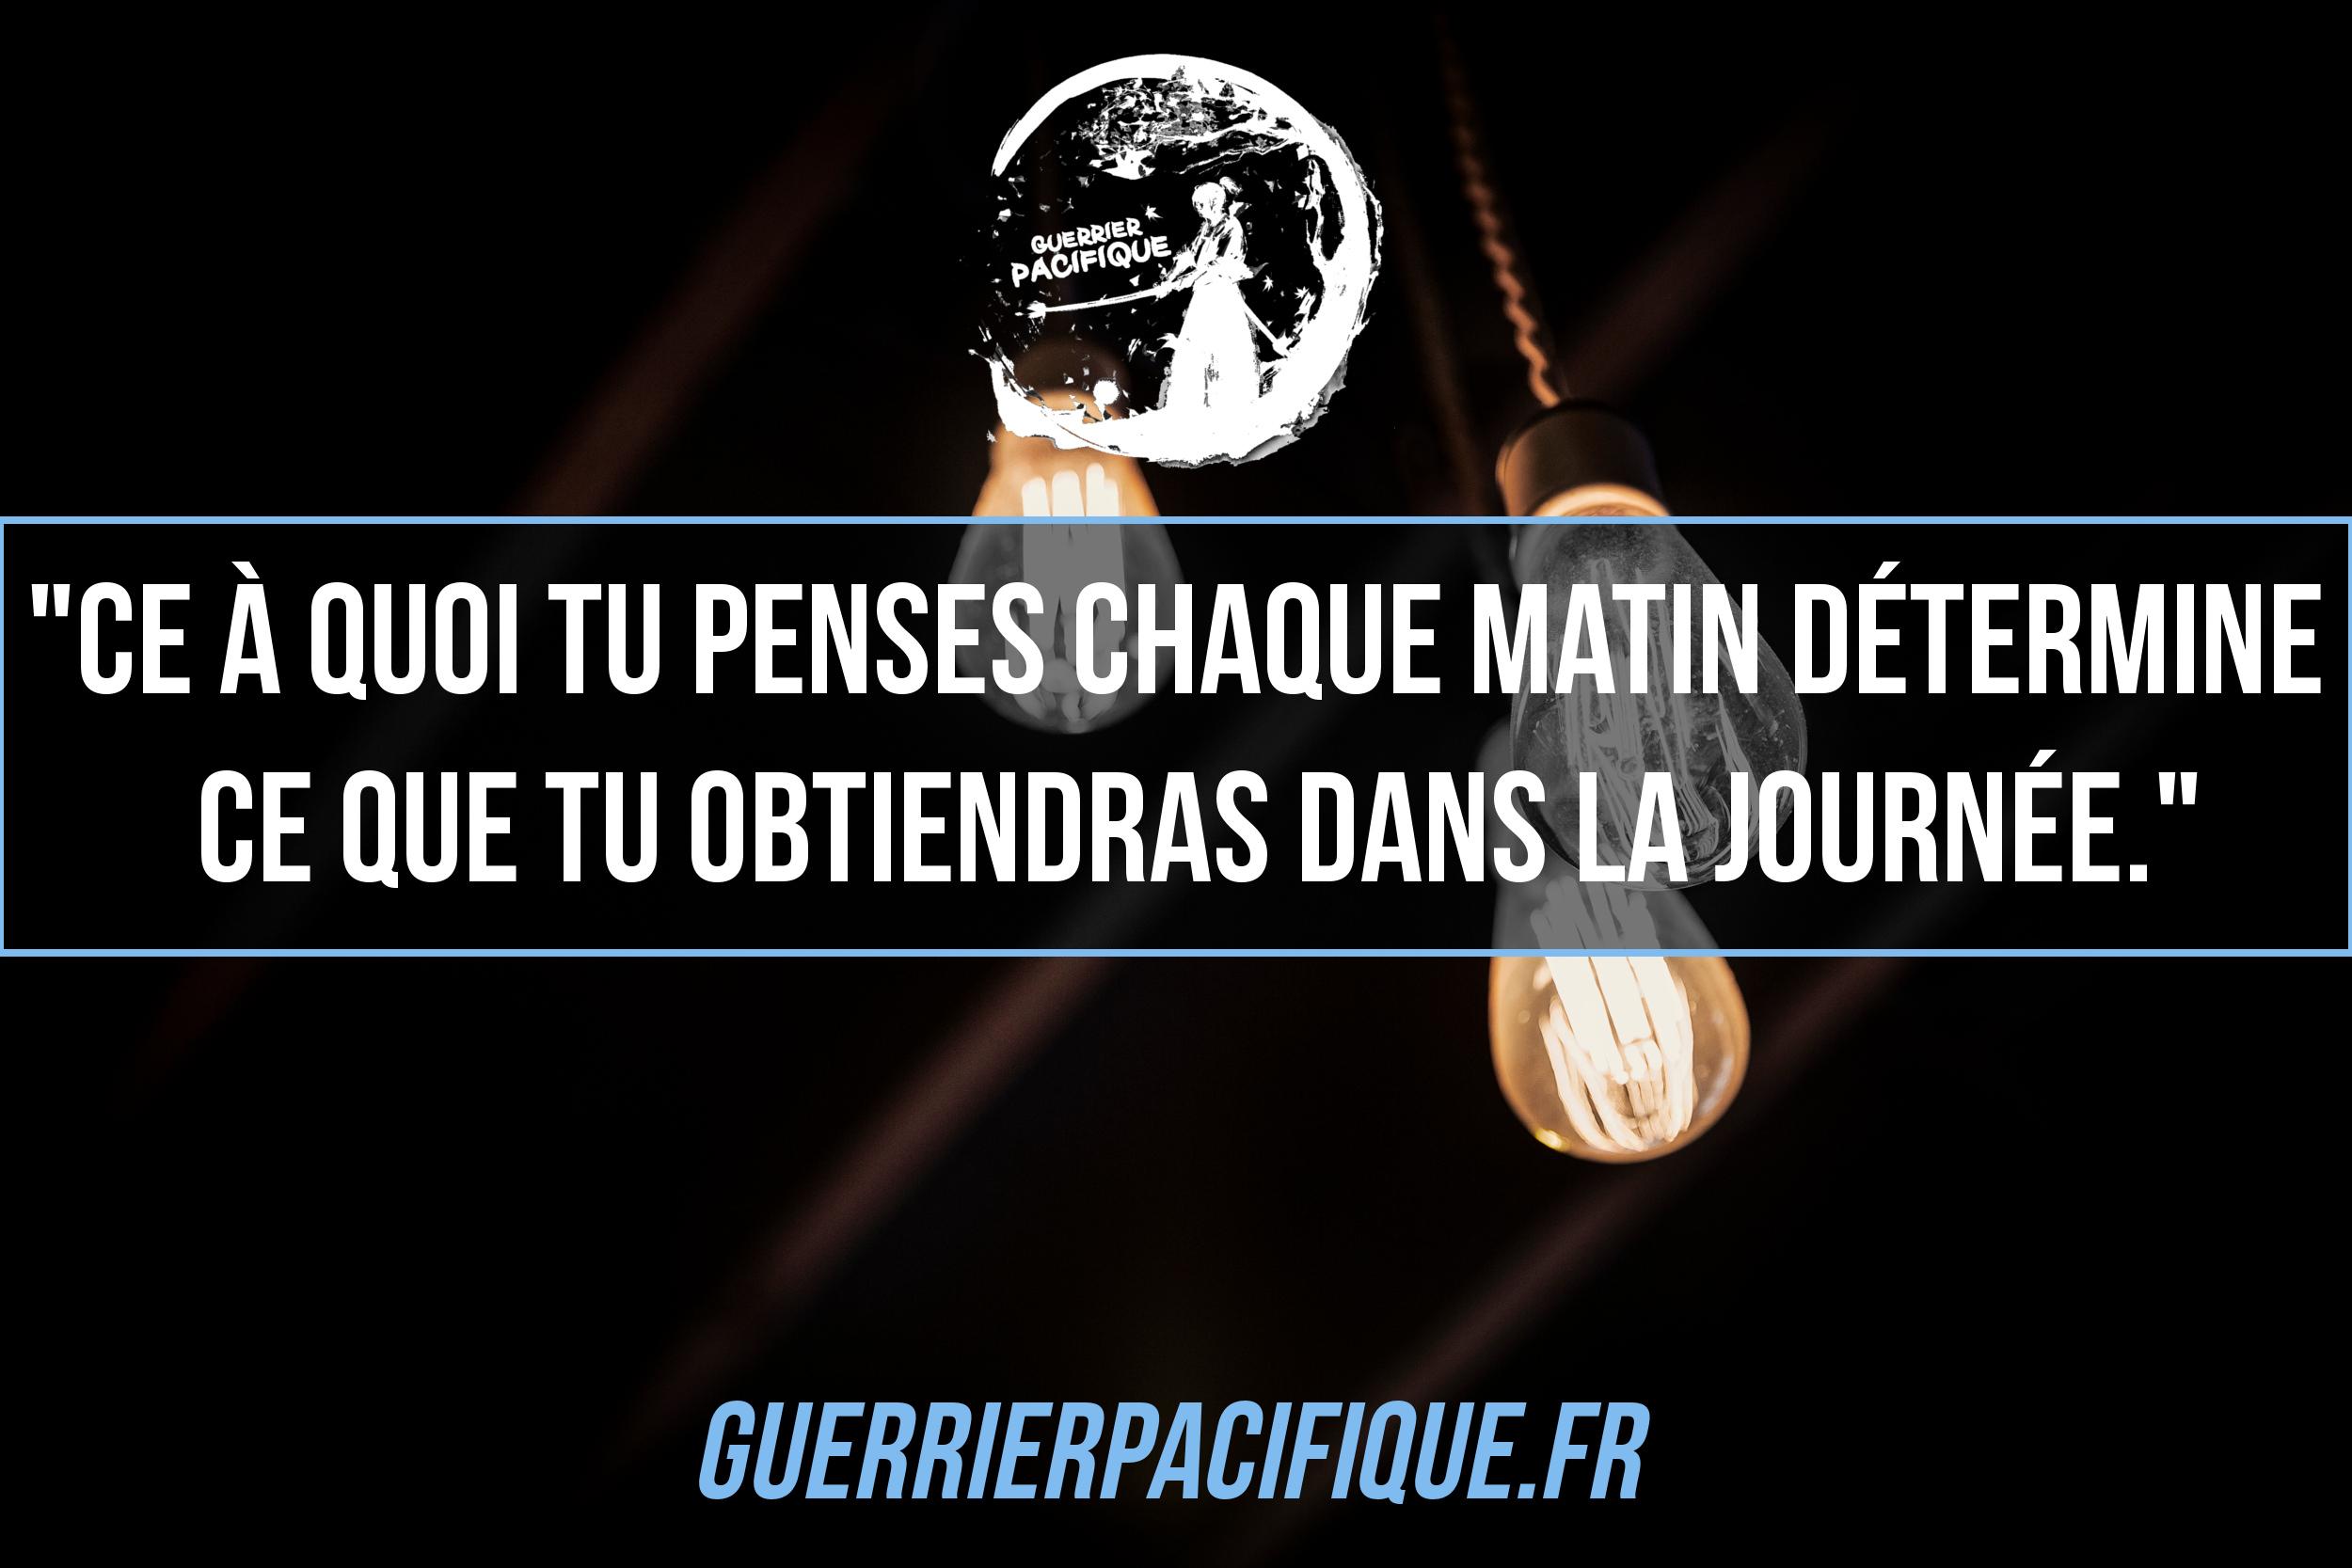 instagramquote133_guerrier_pacifique